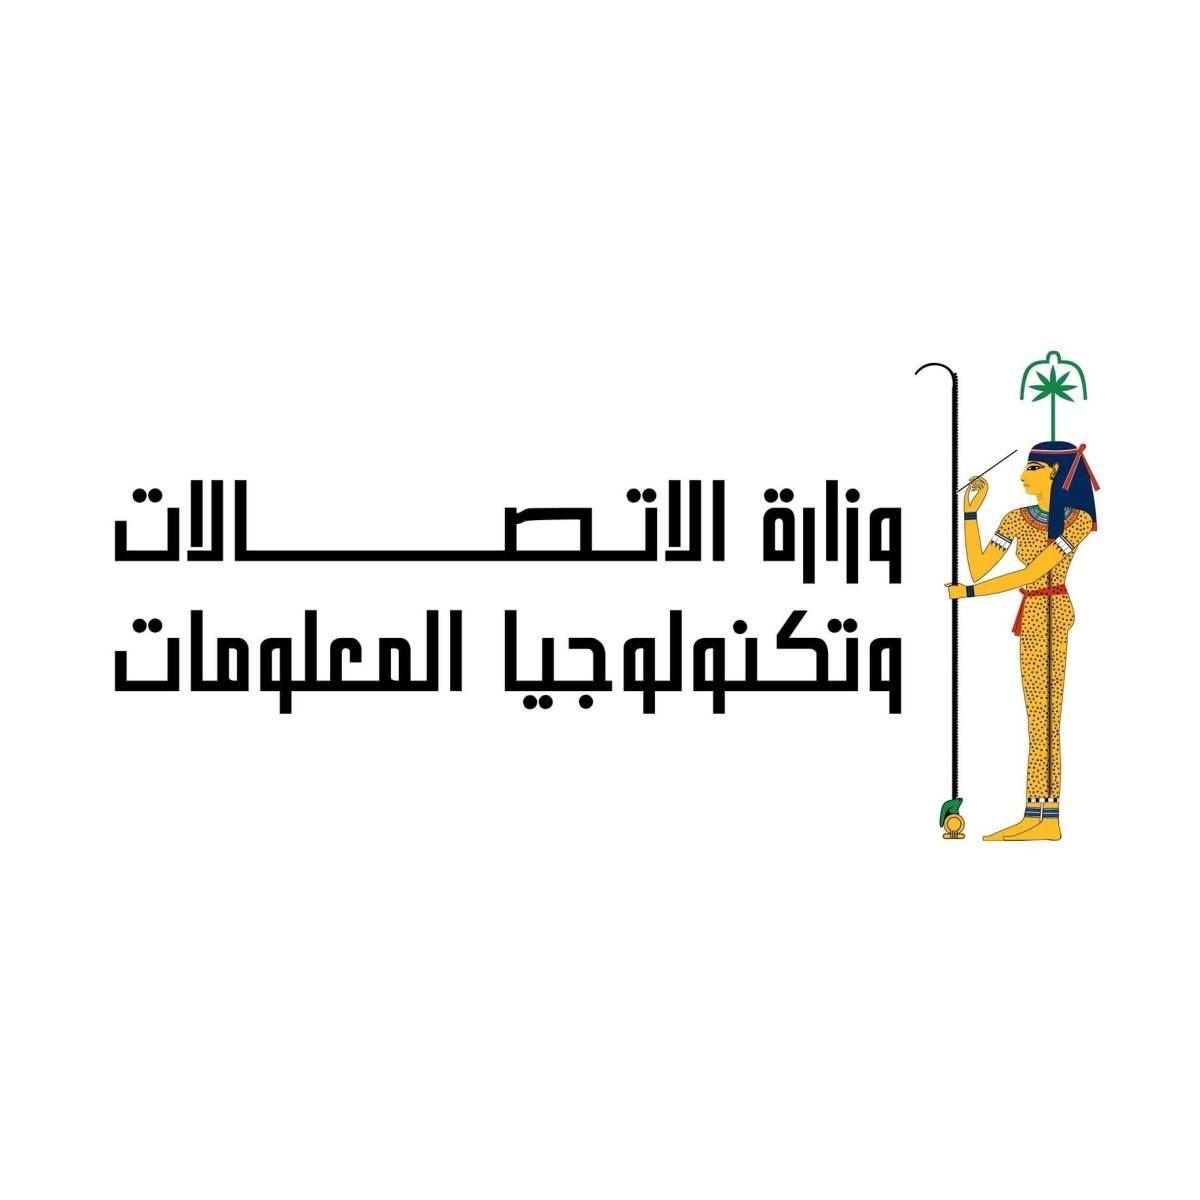 Pin By شيماء فؤاد On Shaimass Home Decor Decals Home Decor Decor